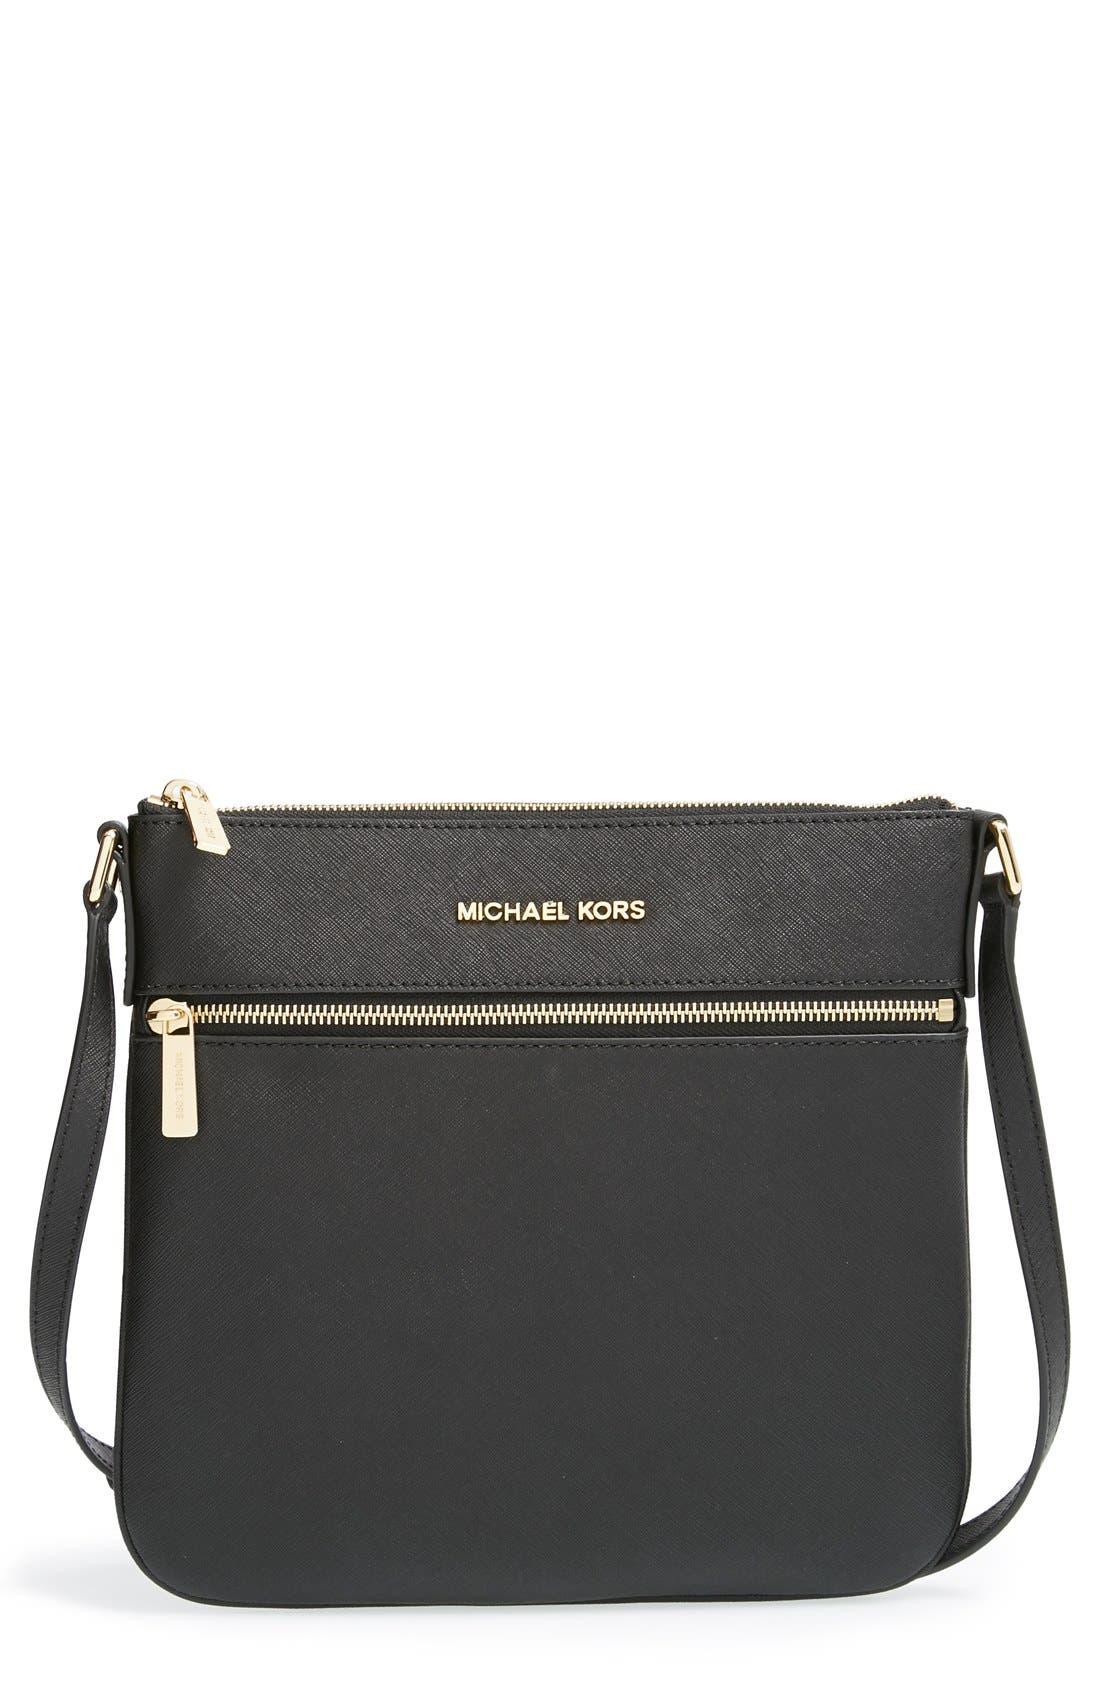 'Bedford' Saffiano Leather Flat Crossbody Bag, Main, color, 001